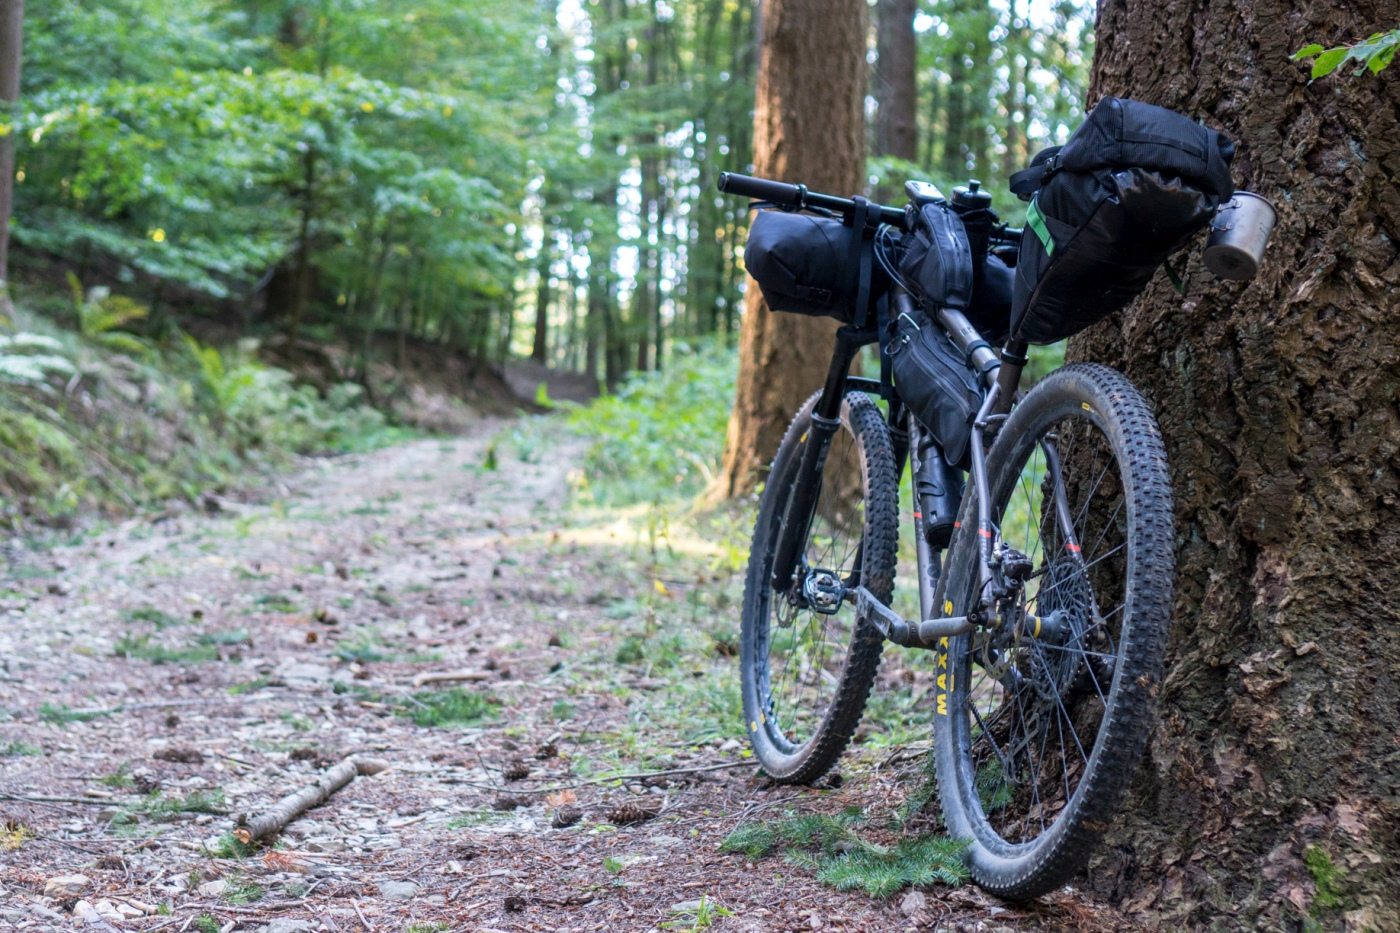 pratomagno_bikepacking-15